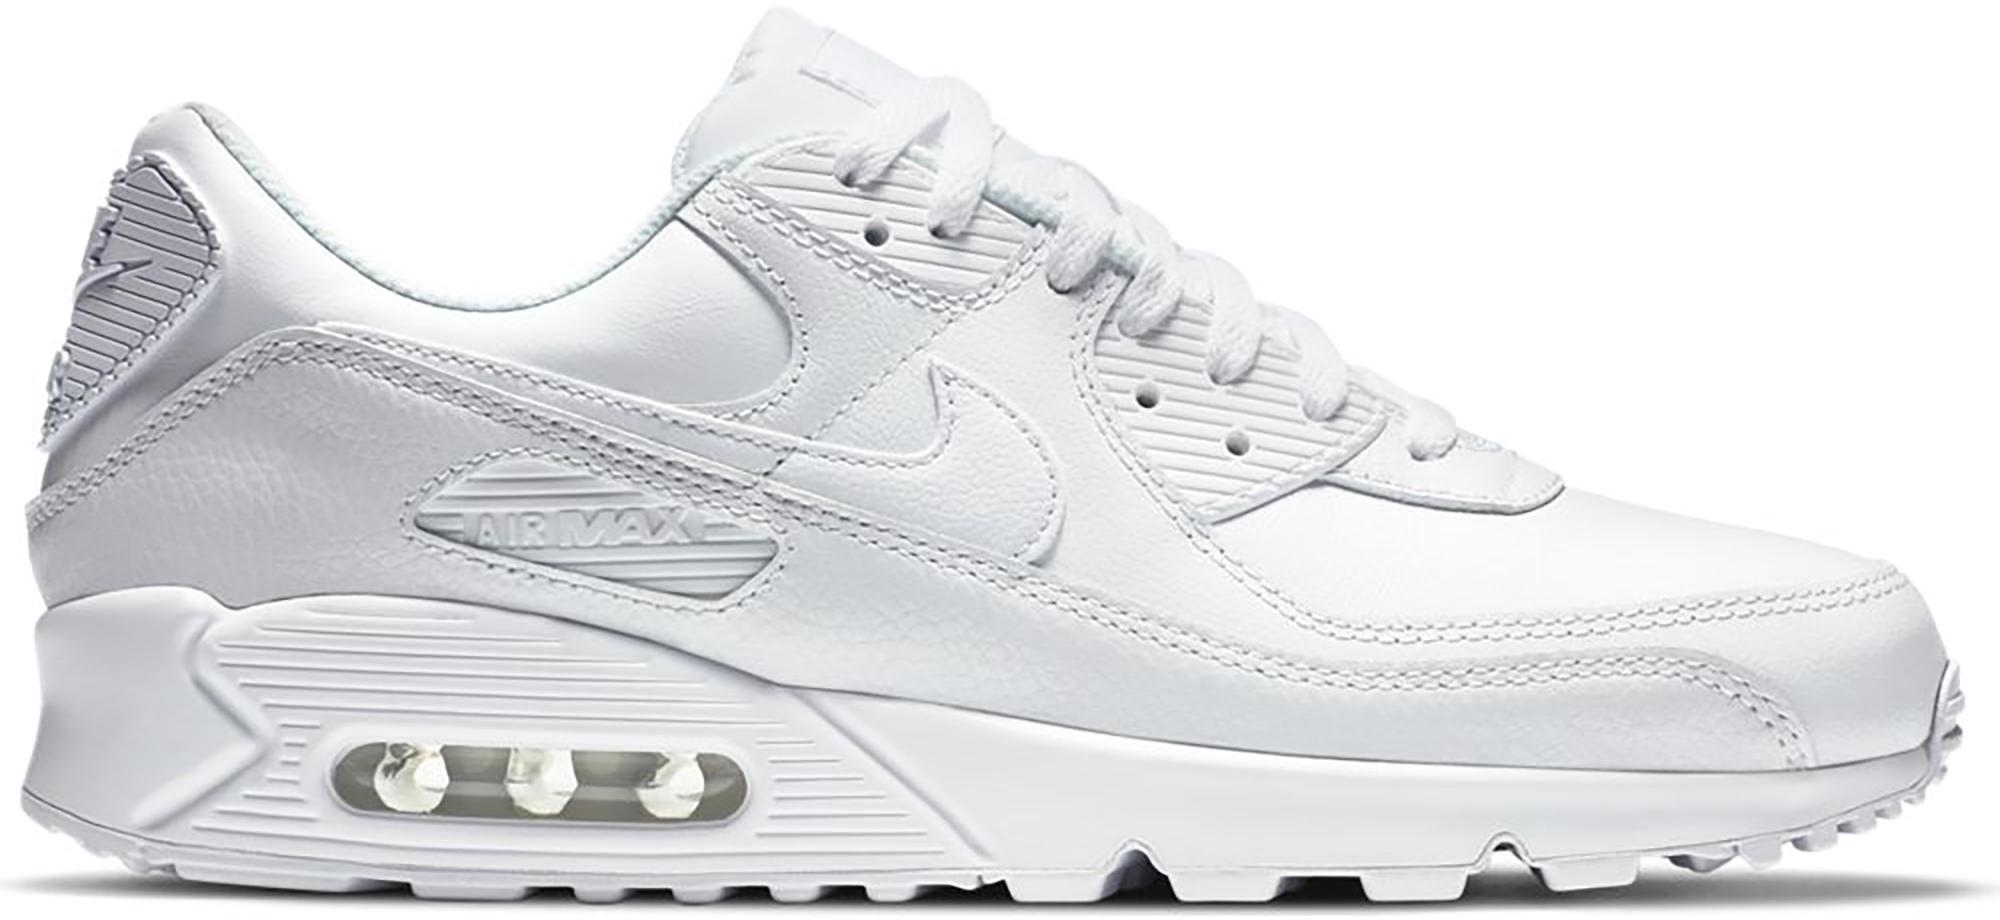 Nike Air Max 90 Leather Triple White